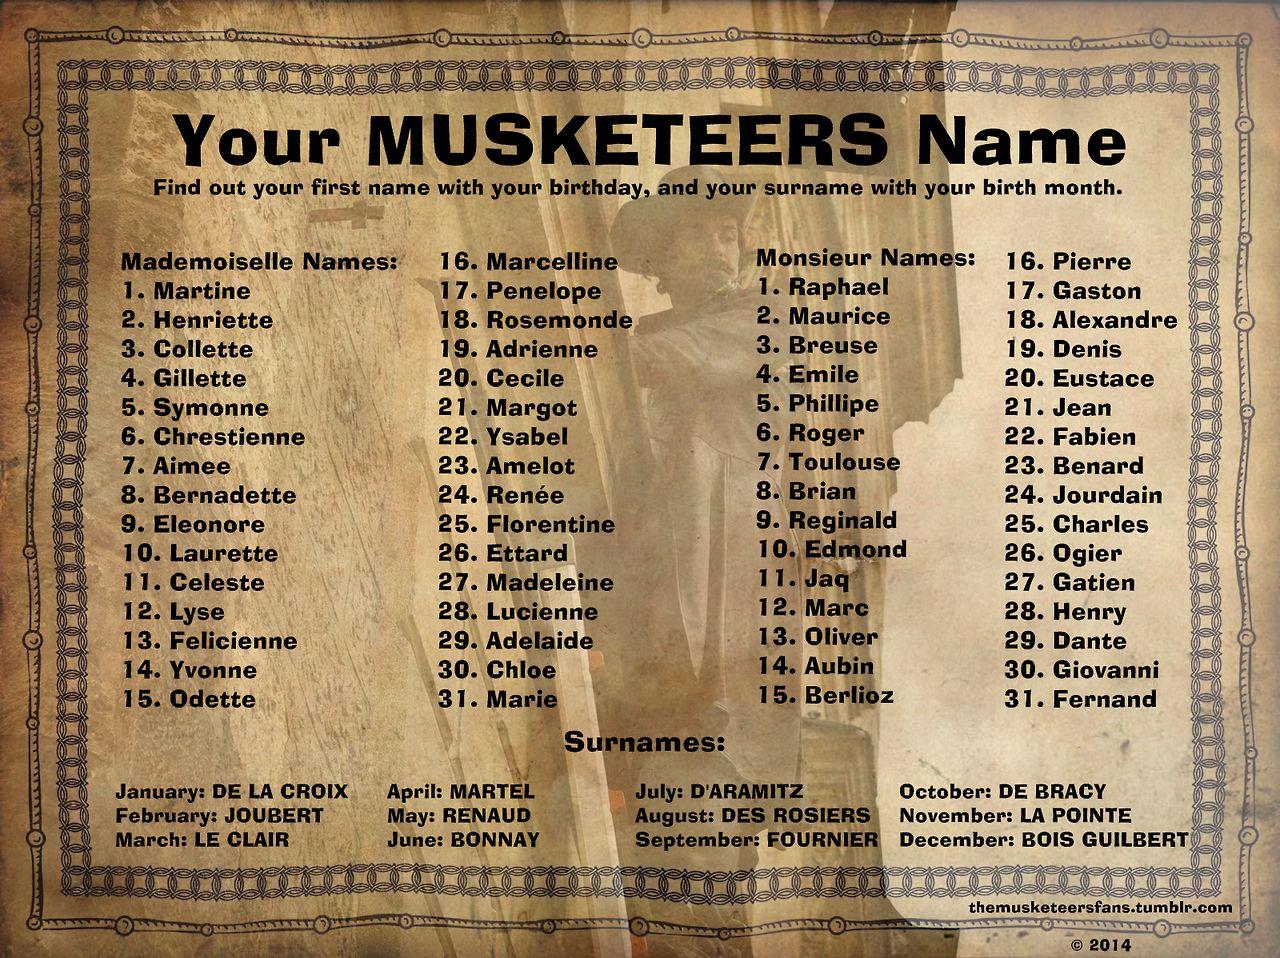 Tumblr Musketeers Bbc Musketeers Names